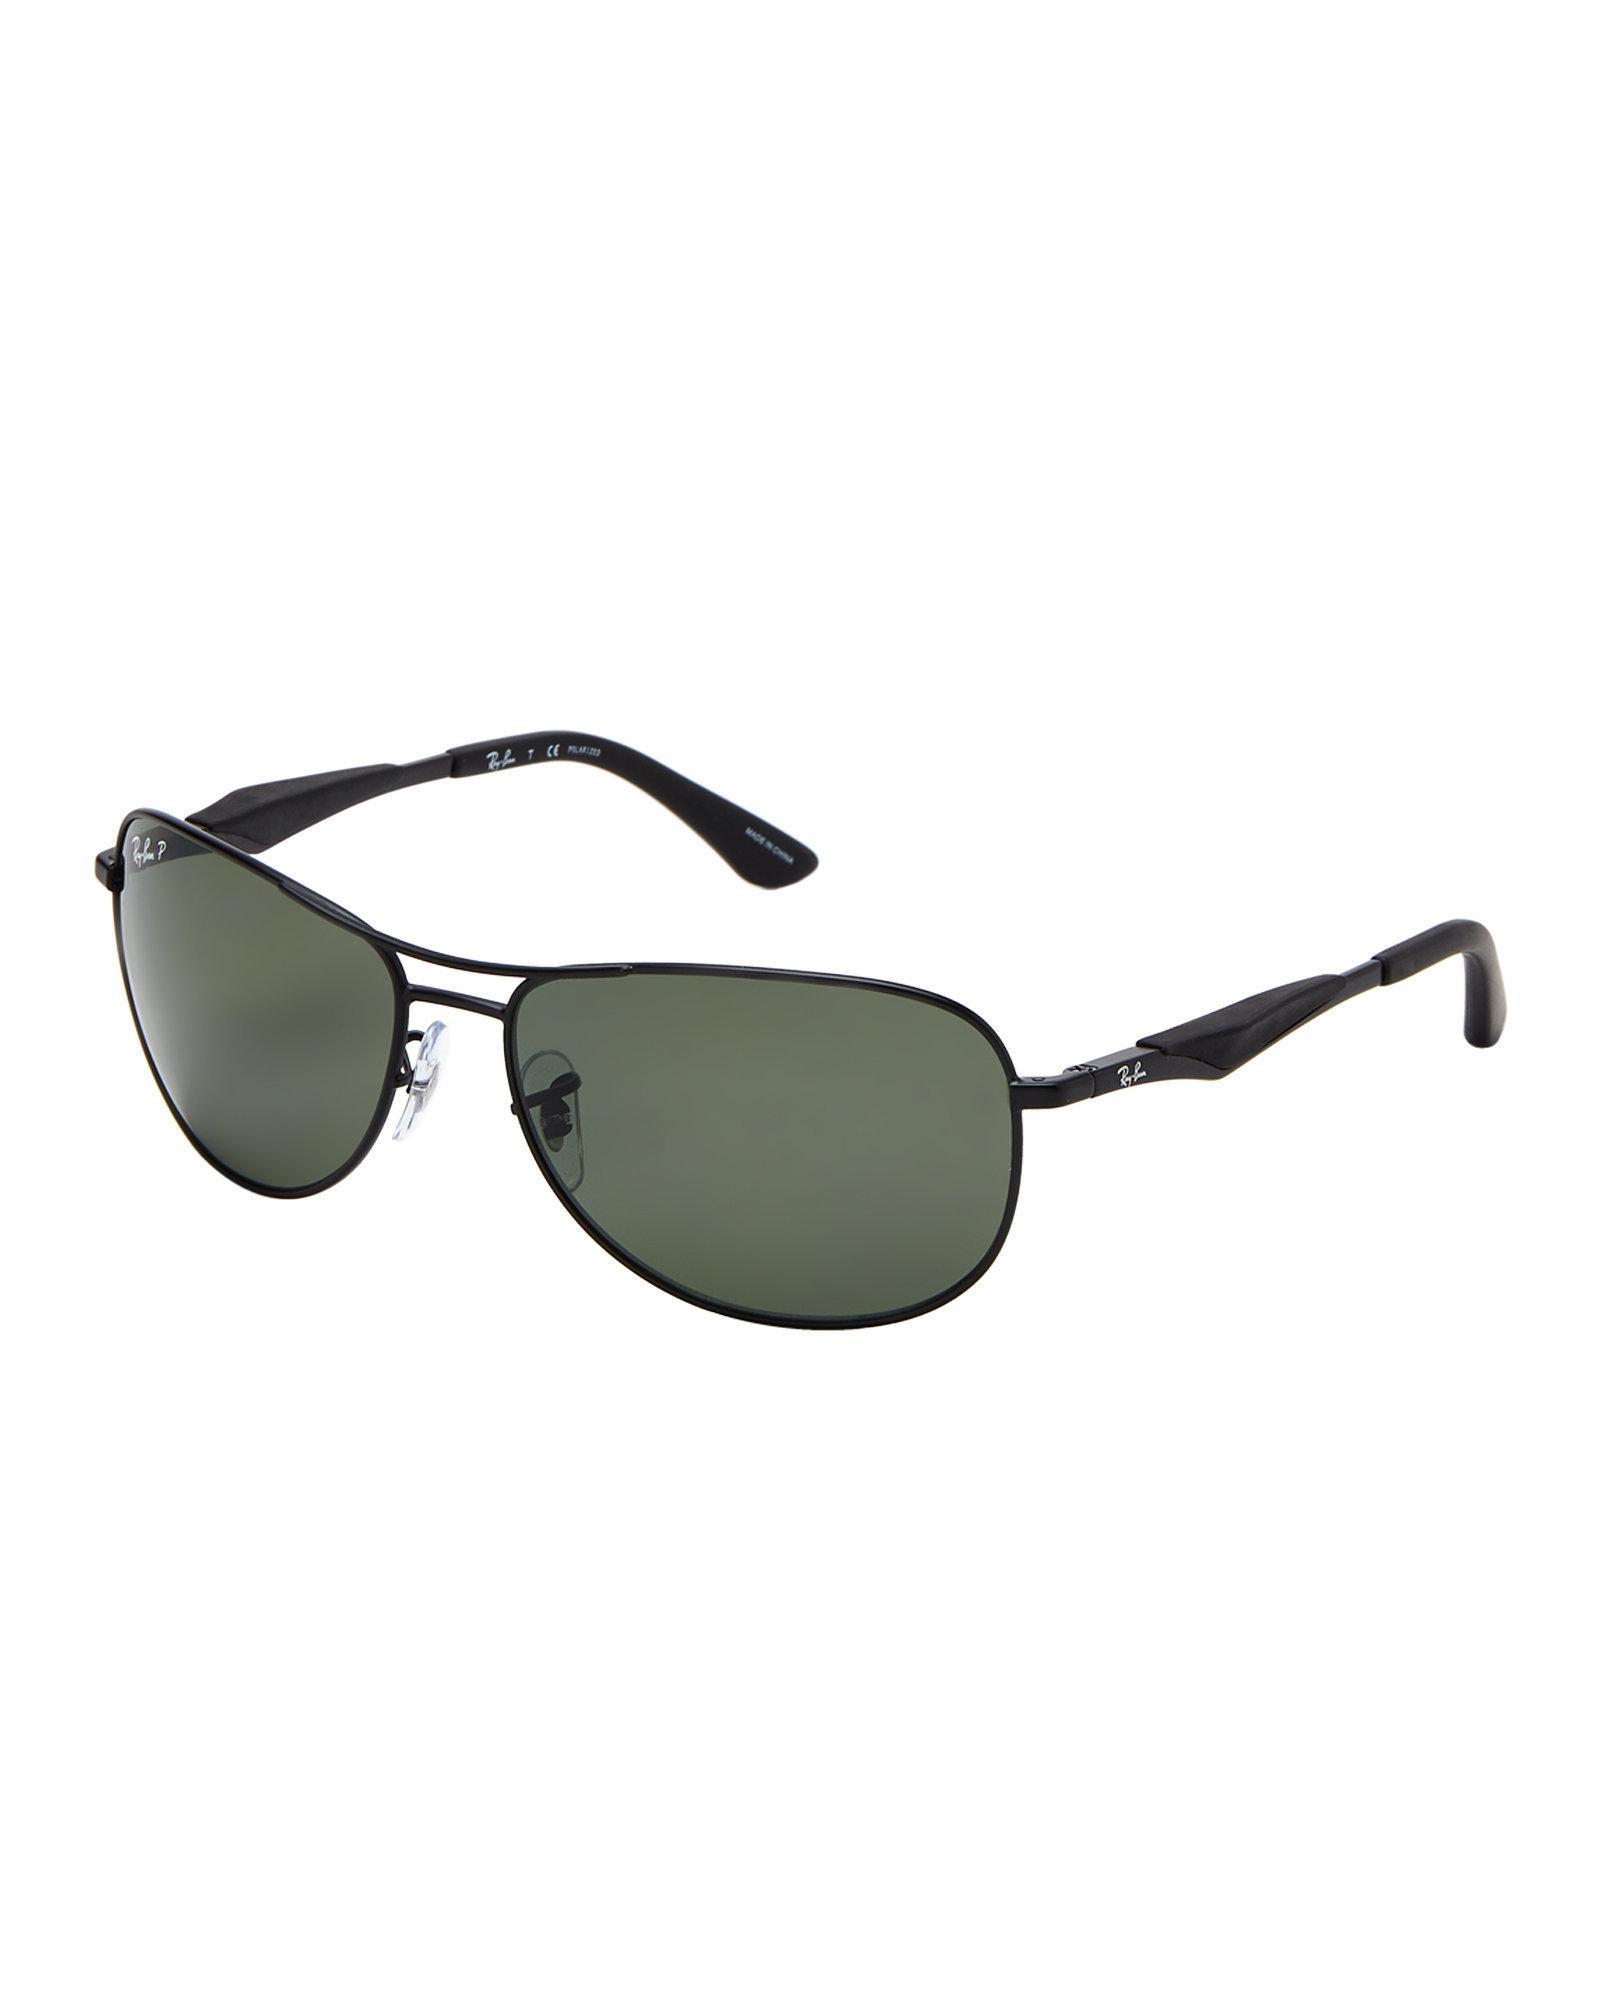 01c971e2787 Lyst - Ray-Ban Rb 3519 Matte Black Polarized Navigator Sunglasses in ...